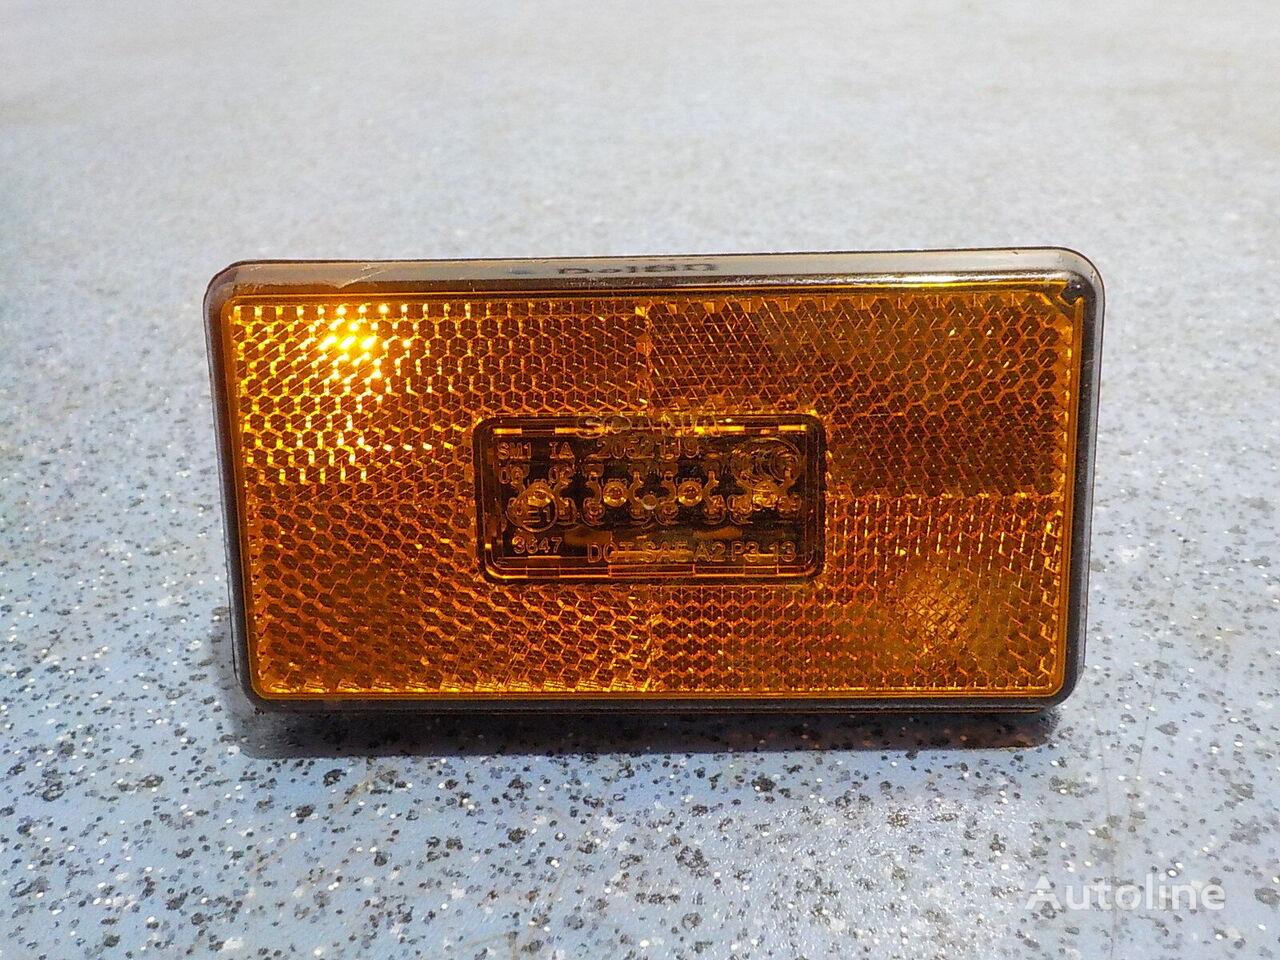 kamyon için Bokovoy lentochnyy homut L=695 Scania yedek parça